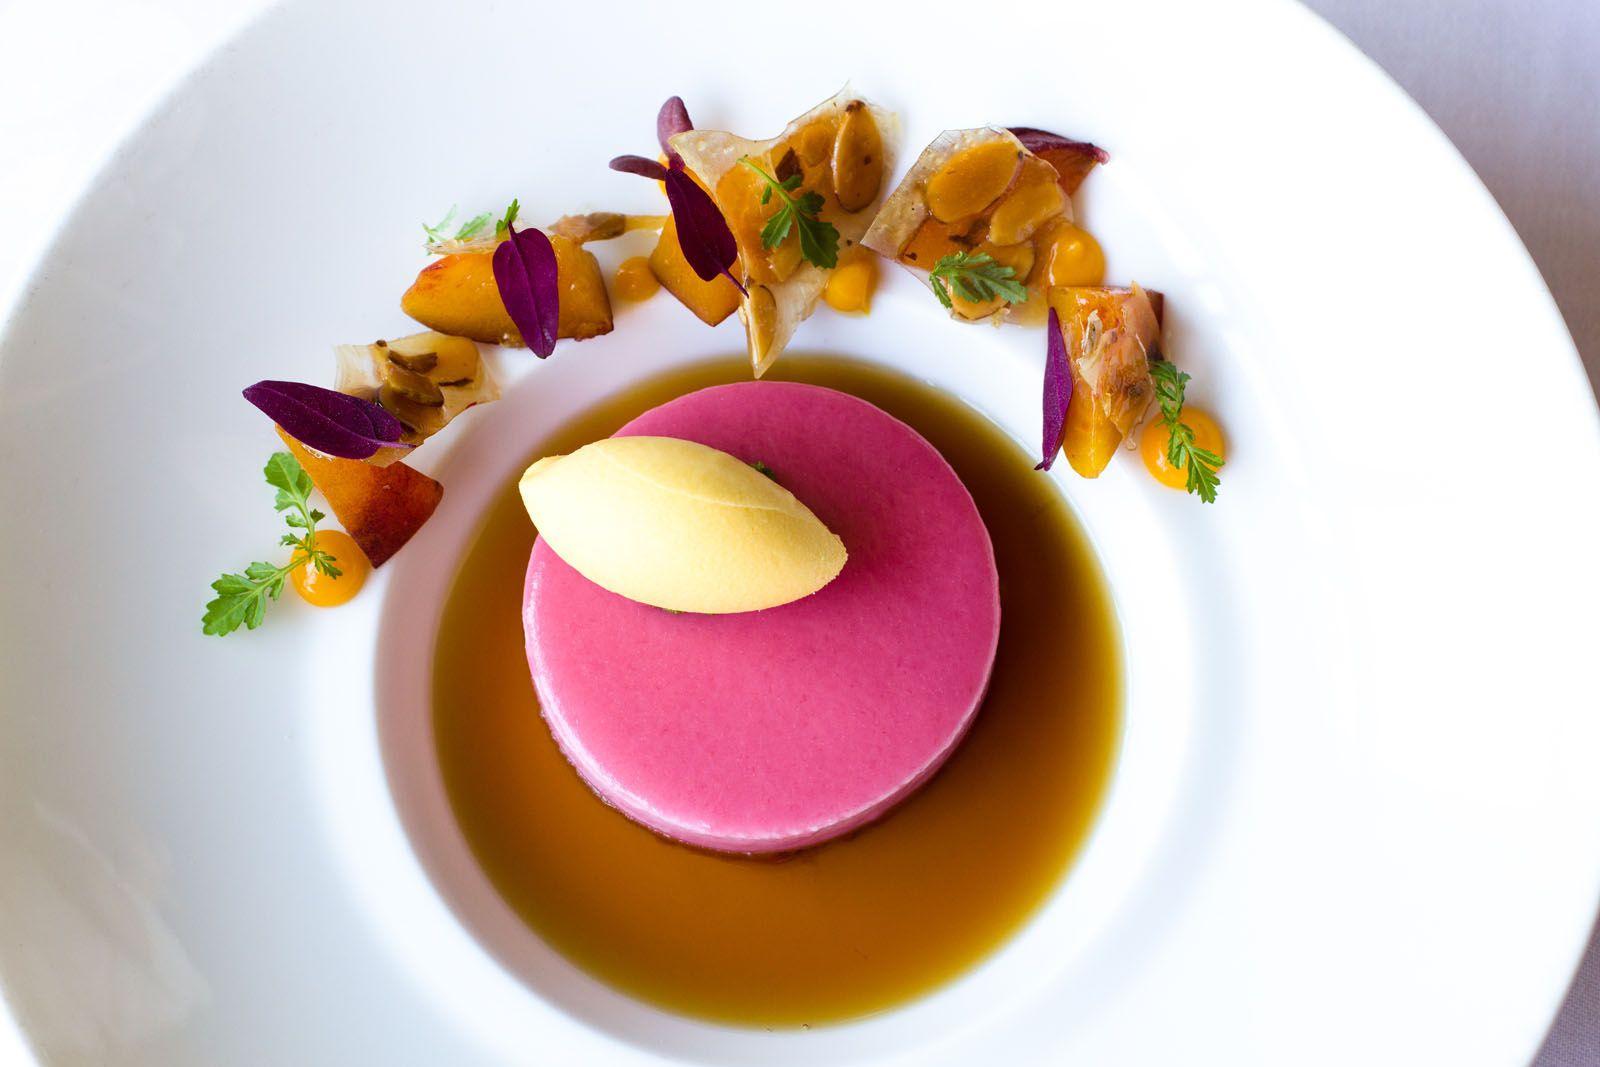 Dish at Acquerello